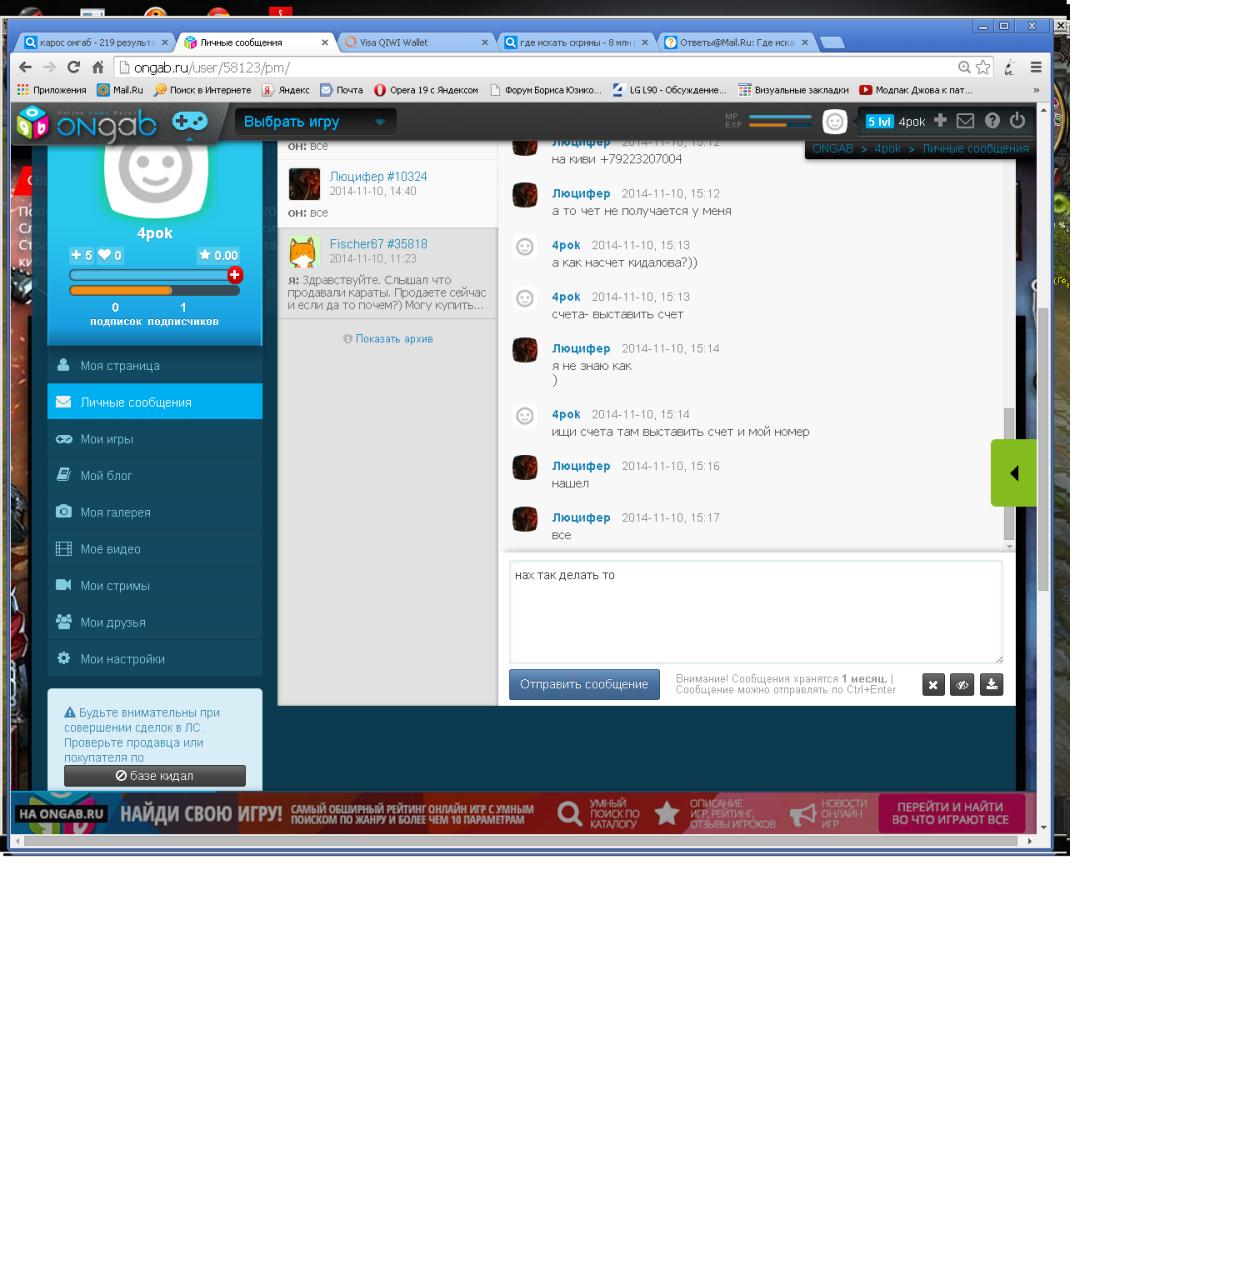 Скриншот Карос: Начало #404690